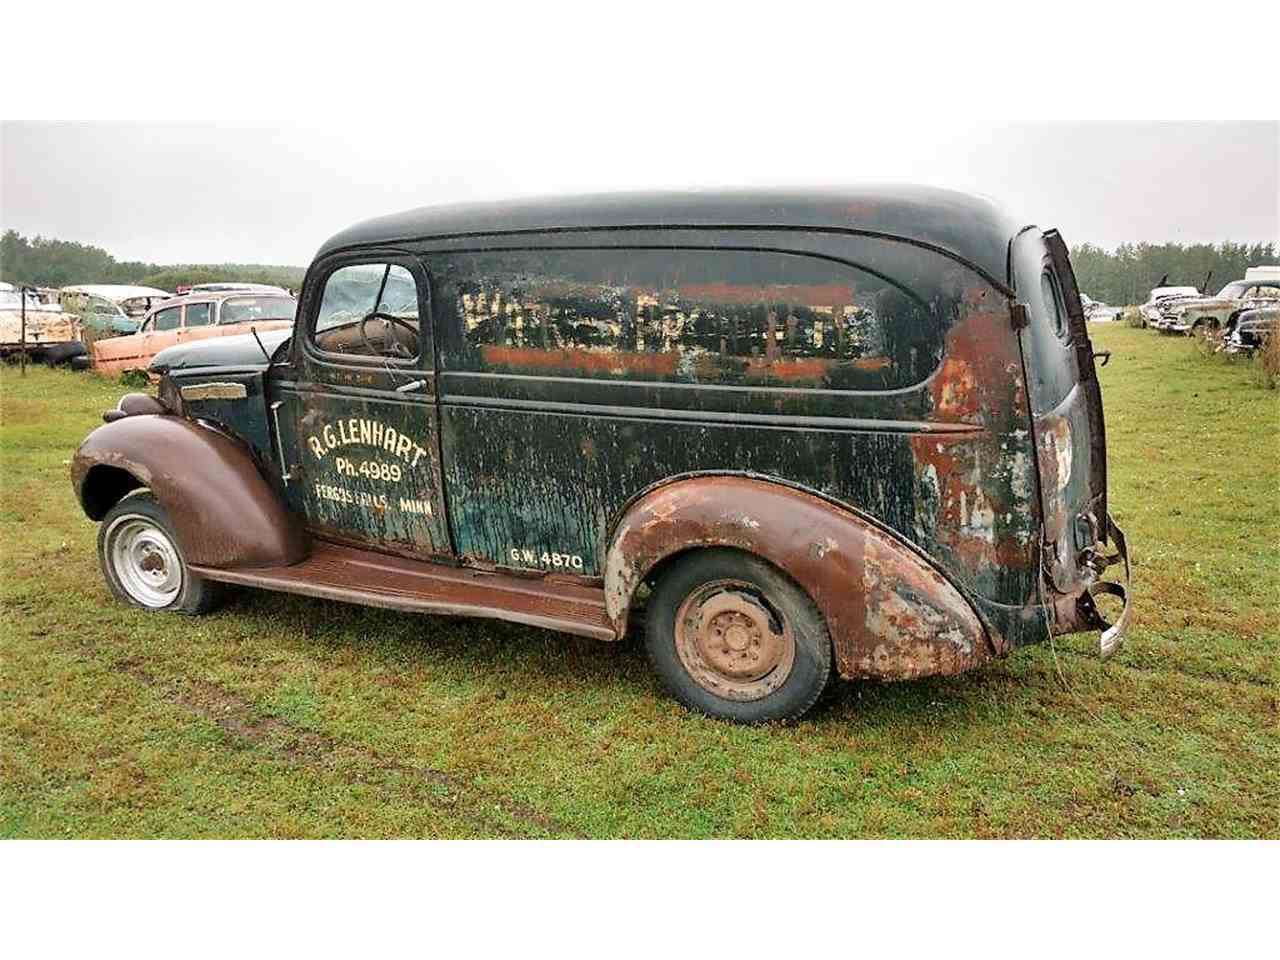 1940 GMC Panel Truck for Sale | ClassicCars.com | CC-1018603